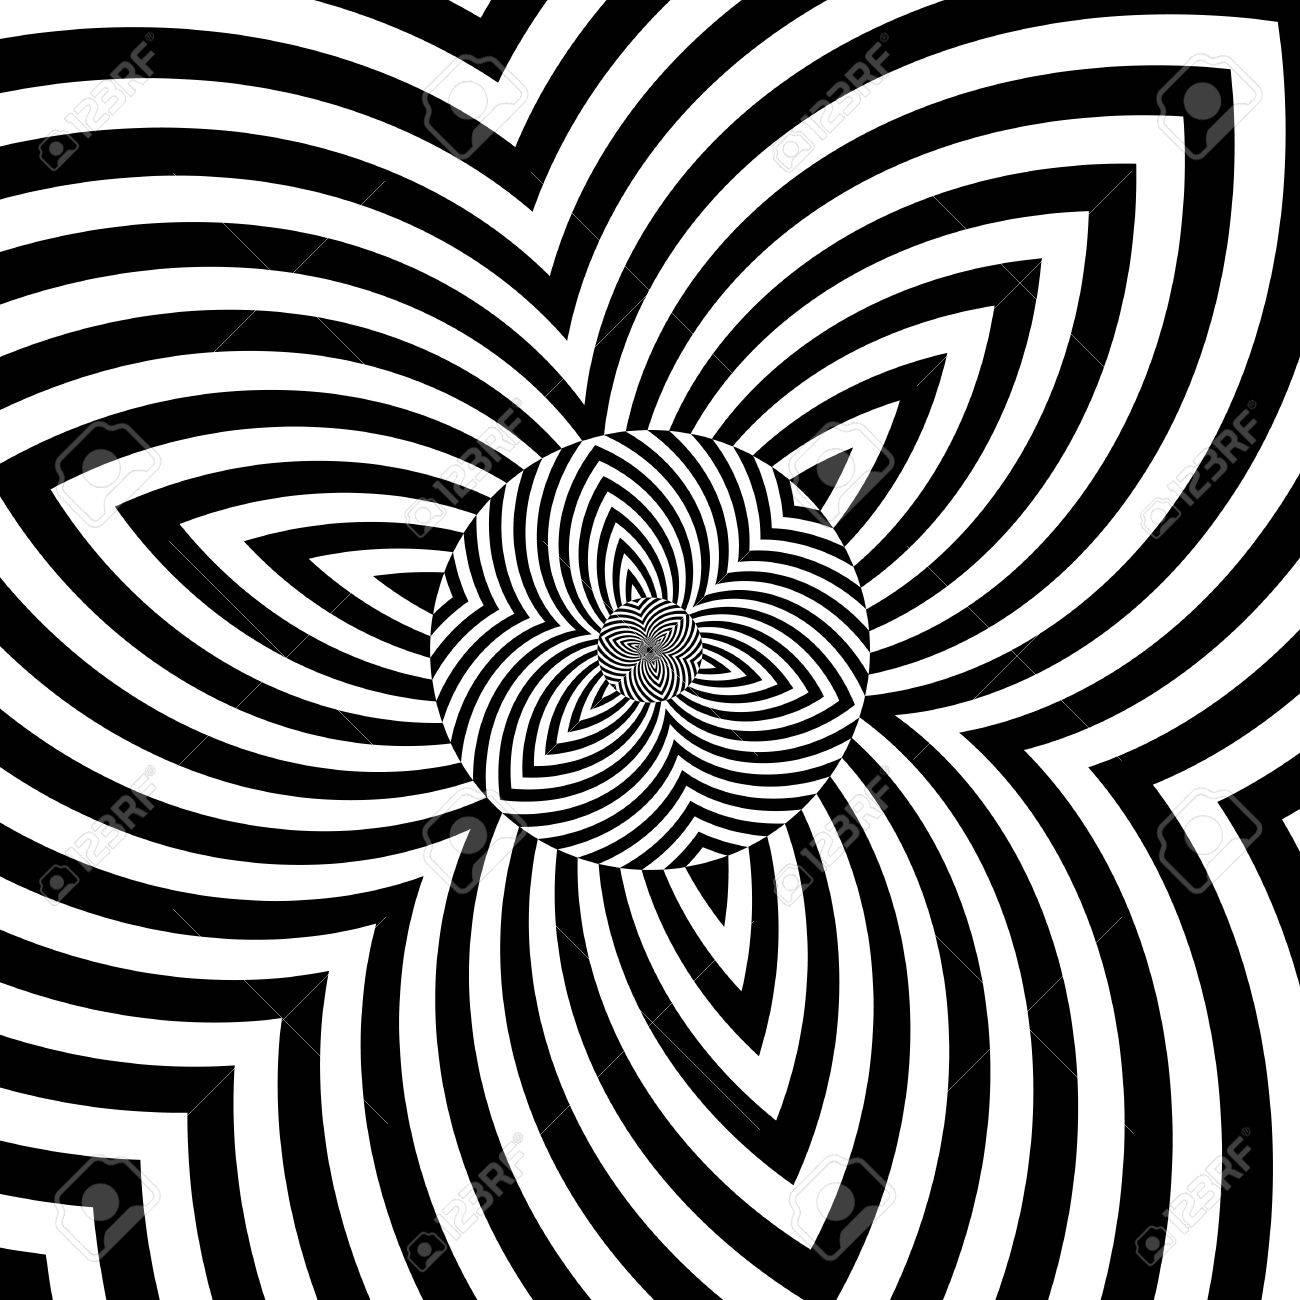 Decorative abstract design Vector art - 16269672